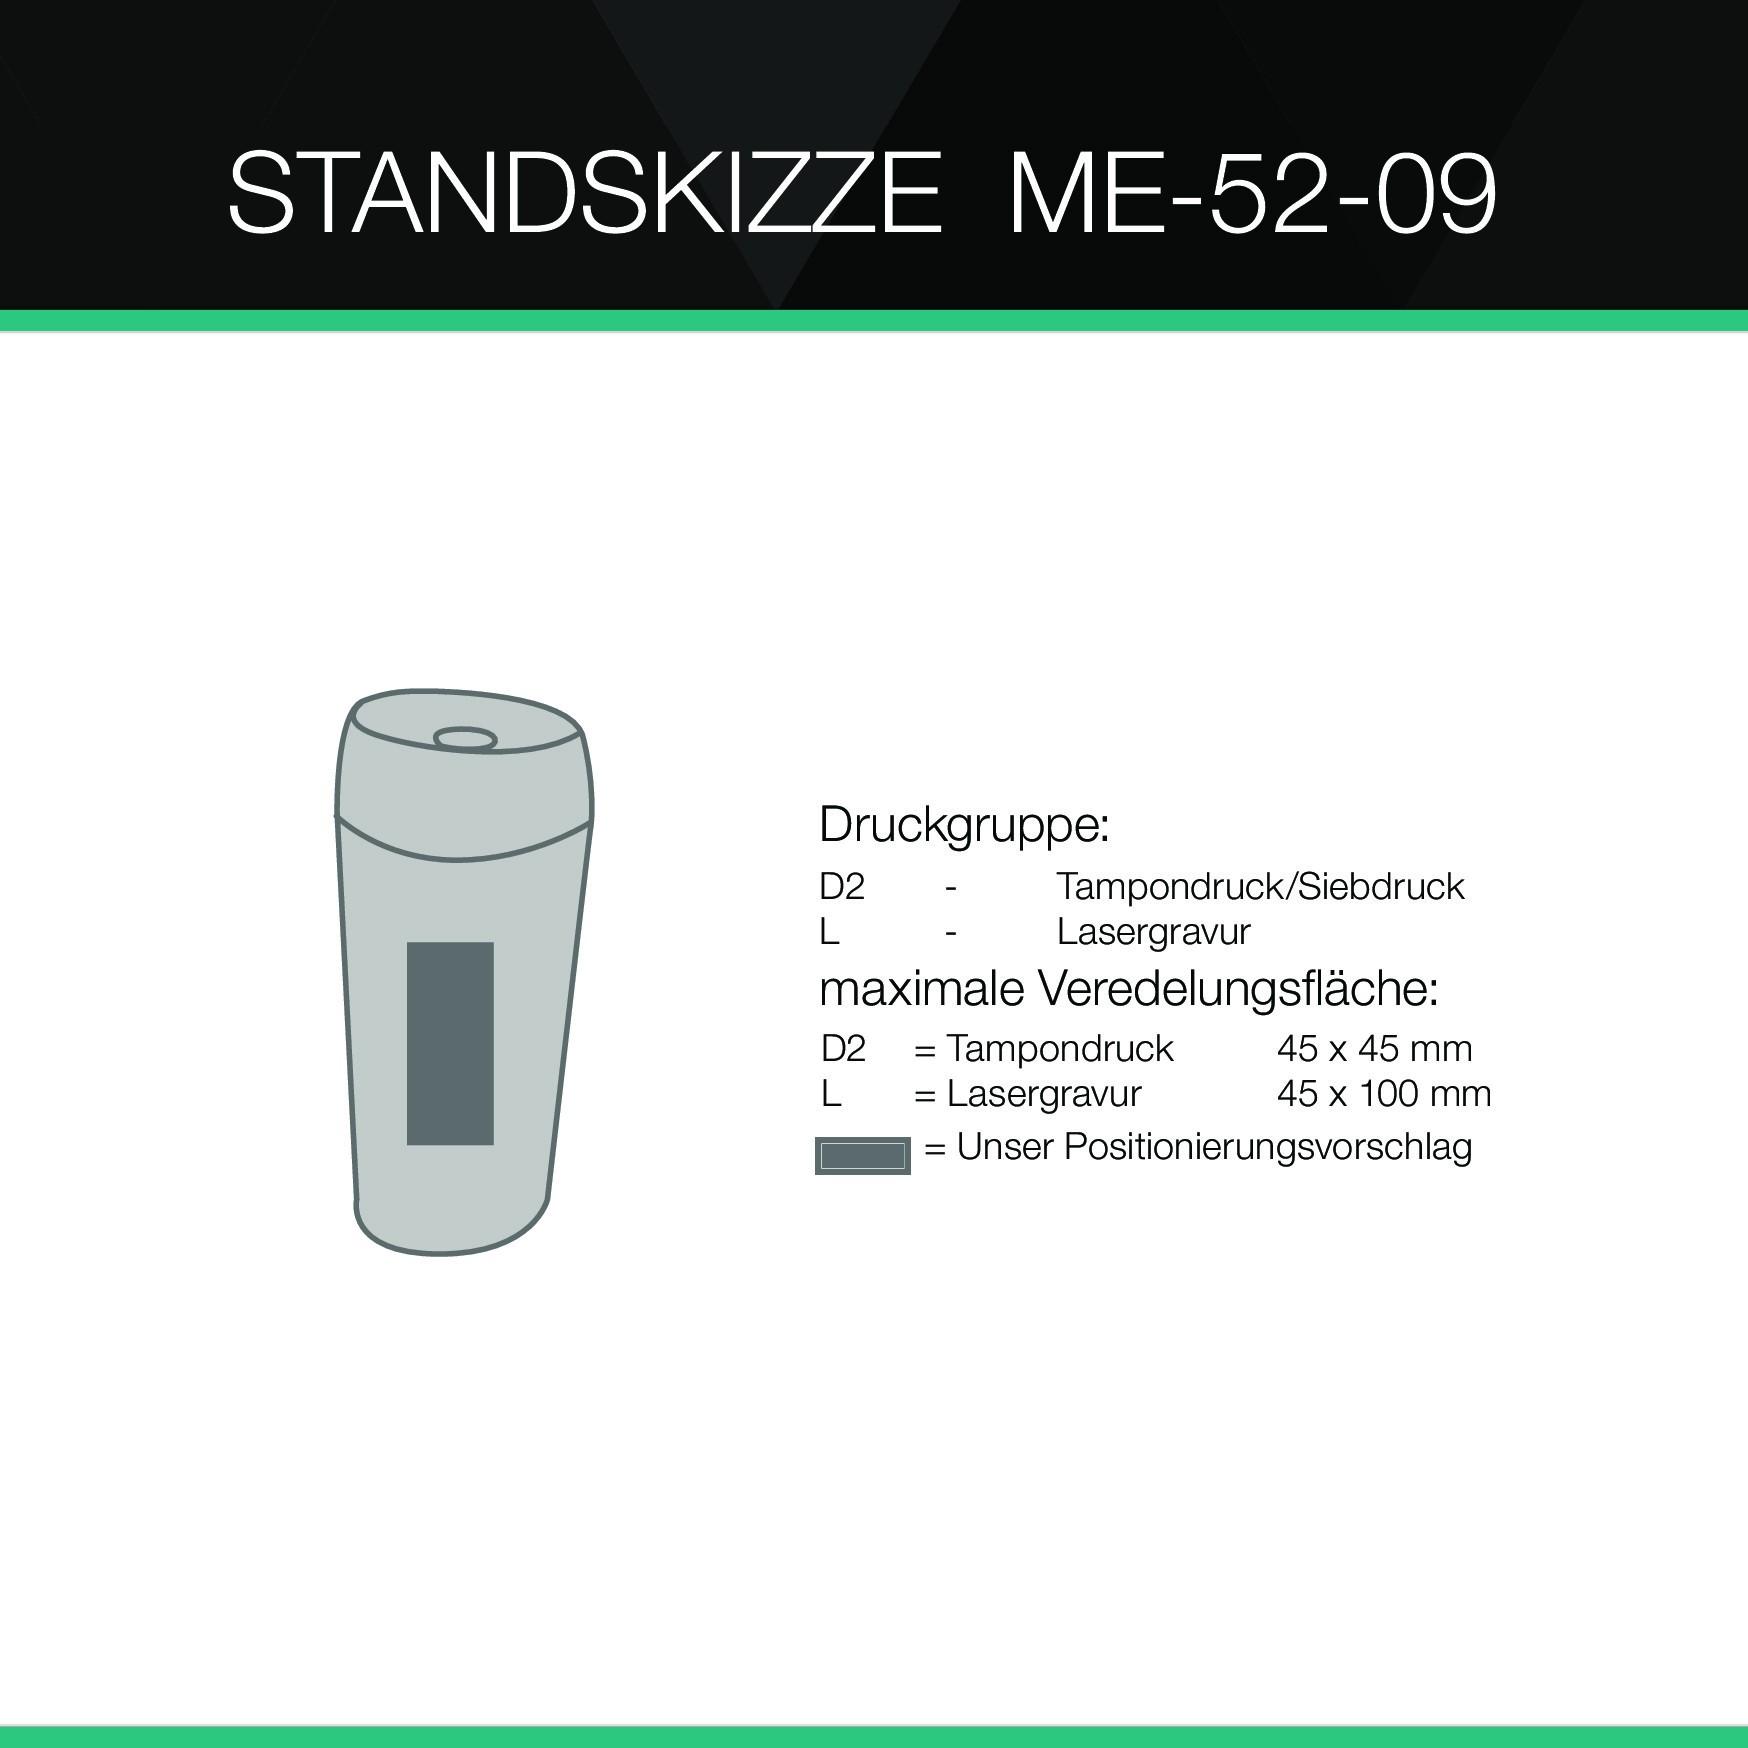 Standskizze